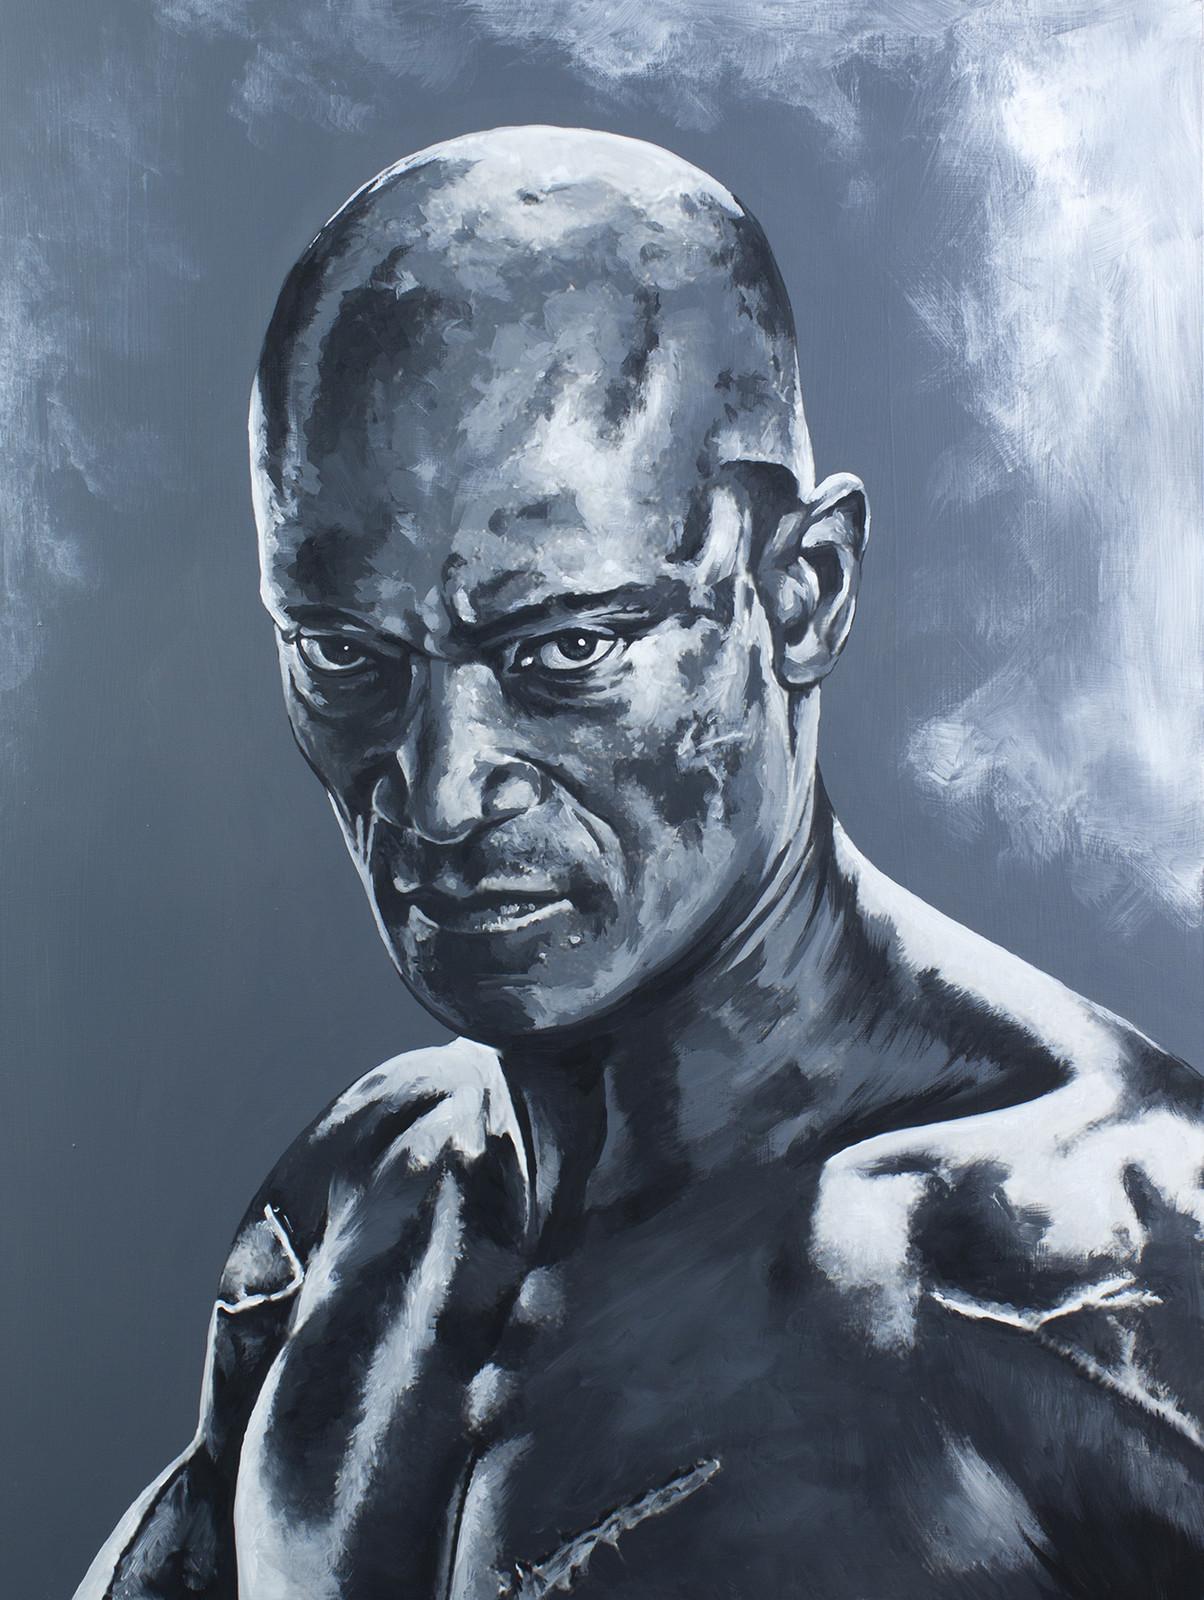 Oenomaus - Peter Mensah Spartacus Series - Acrylic on board. 16x20